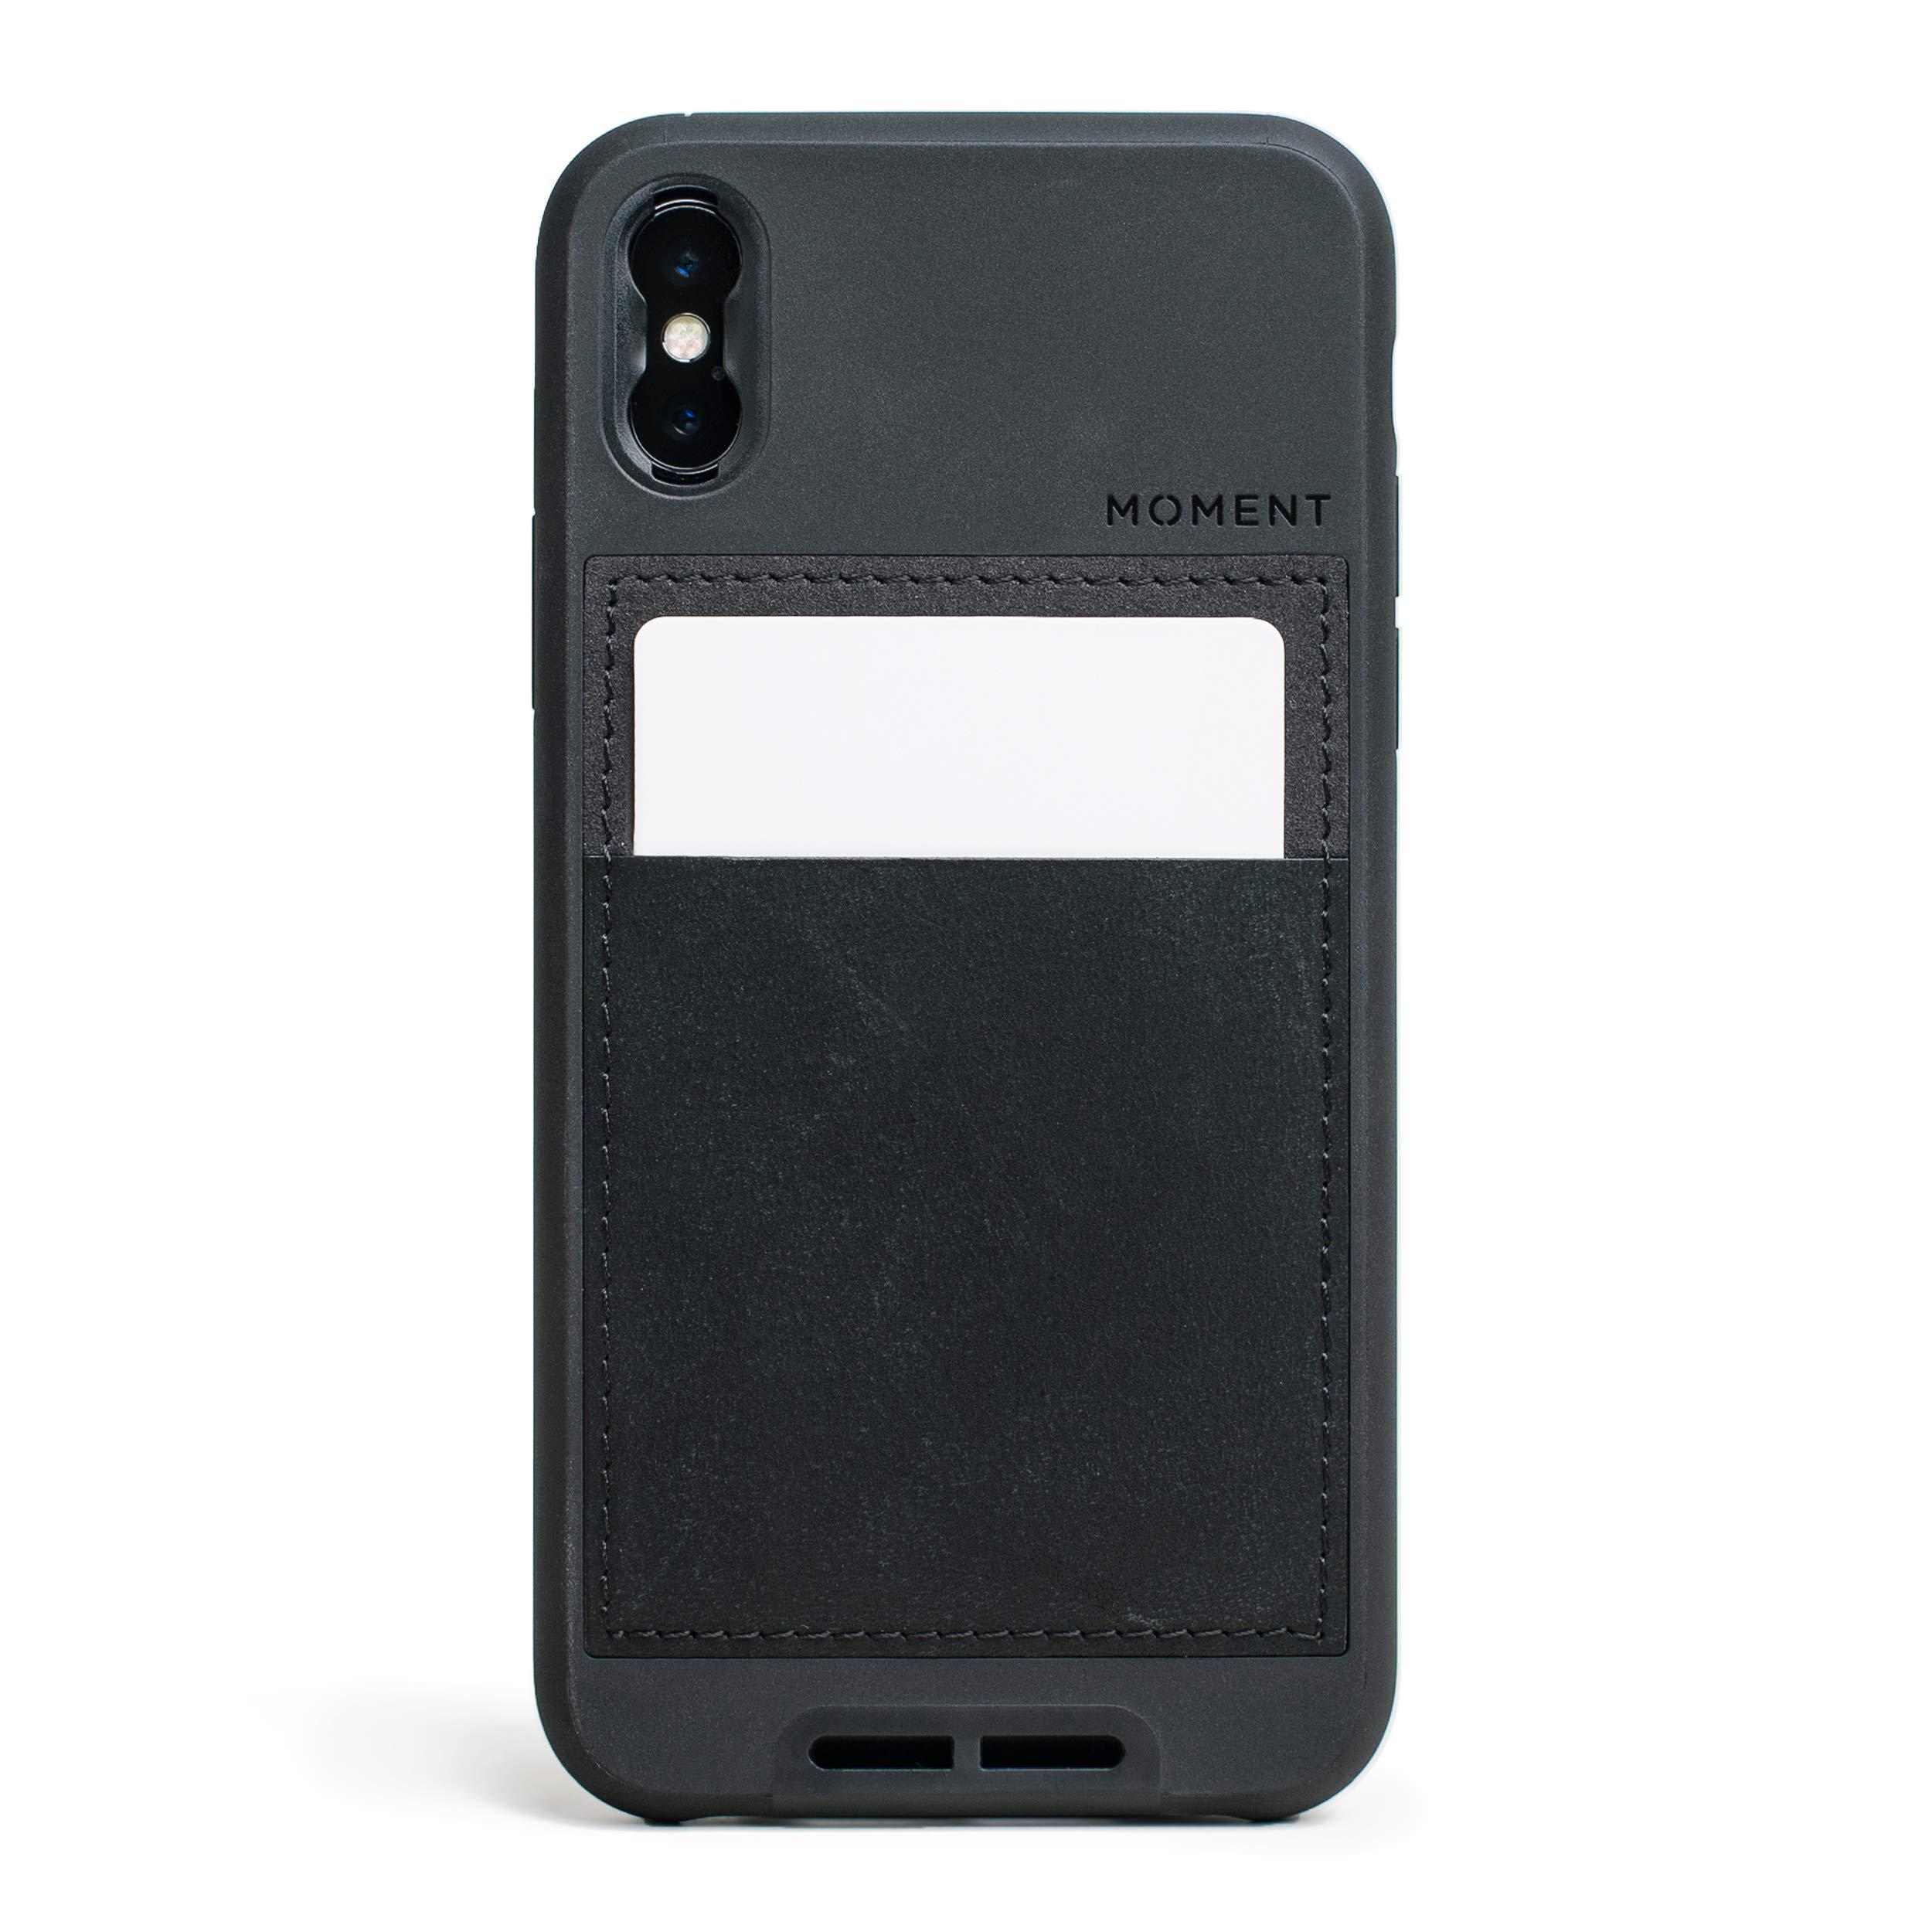 ویکالا · خرید  اصل اورجینال · خرید از آمازون · iPhone X Wallet Case || Moment Photo Case in Black Leather - Thin, Protective, Wrist Strap Friendly Wallet case for Camera Lovers. wekala · ویکالا